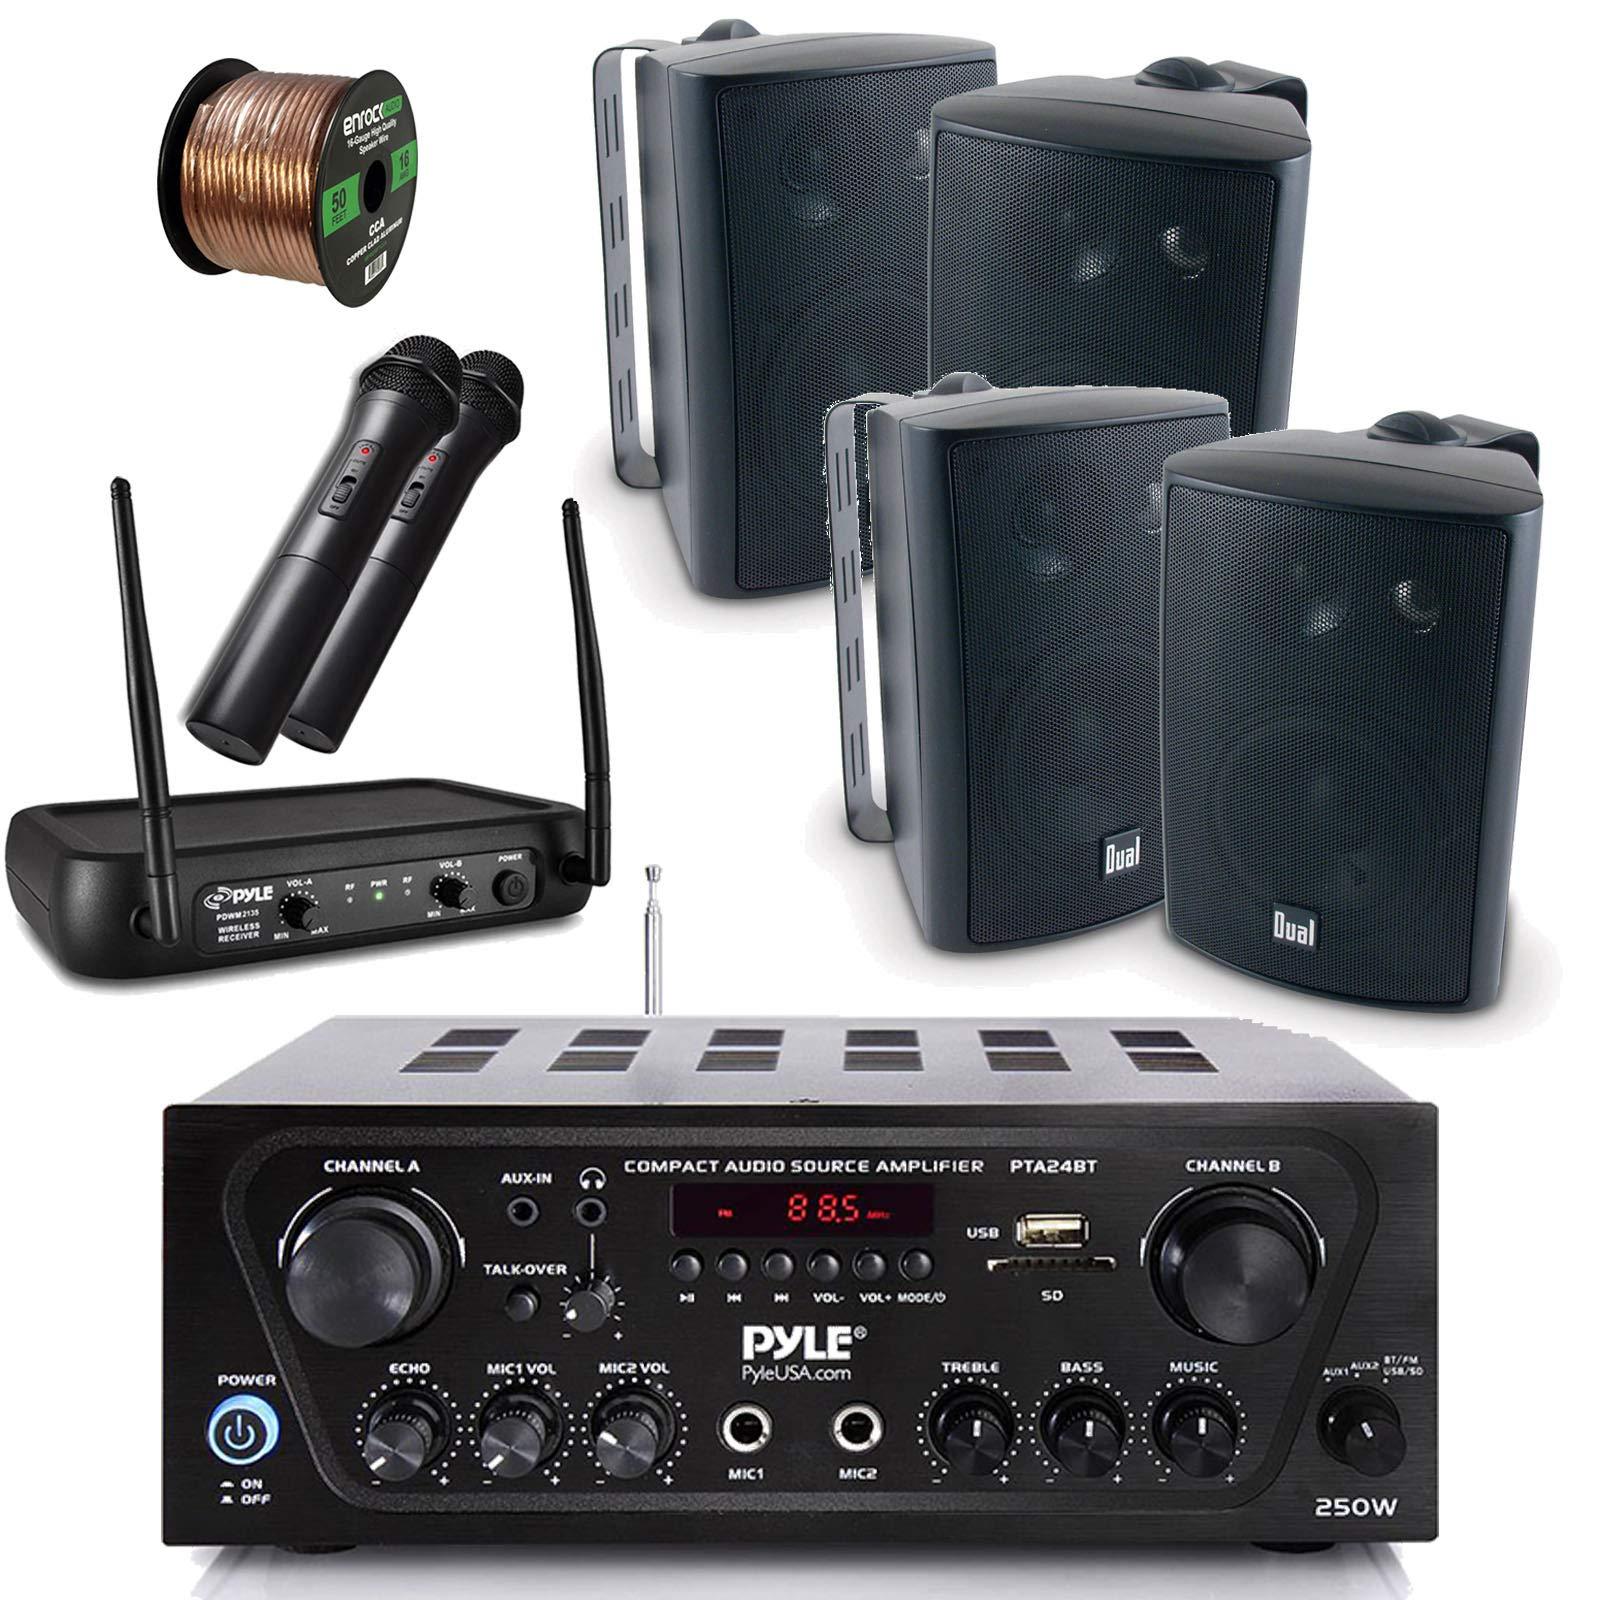 Pyle Wireless Bluetooth Stereo Receiver Amplifier, Dual Channel VHF Wireless Microphone System, 4x Dual Electronics 4'' 100-Watt Indoor/Outdoor Speakers - Black, 50Ft Speaker Wire - PA , Karaoke , DJ by Enrock Audio